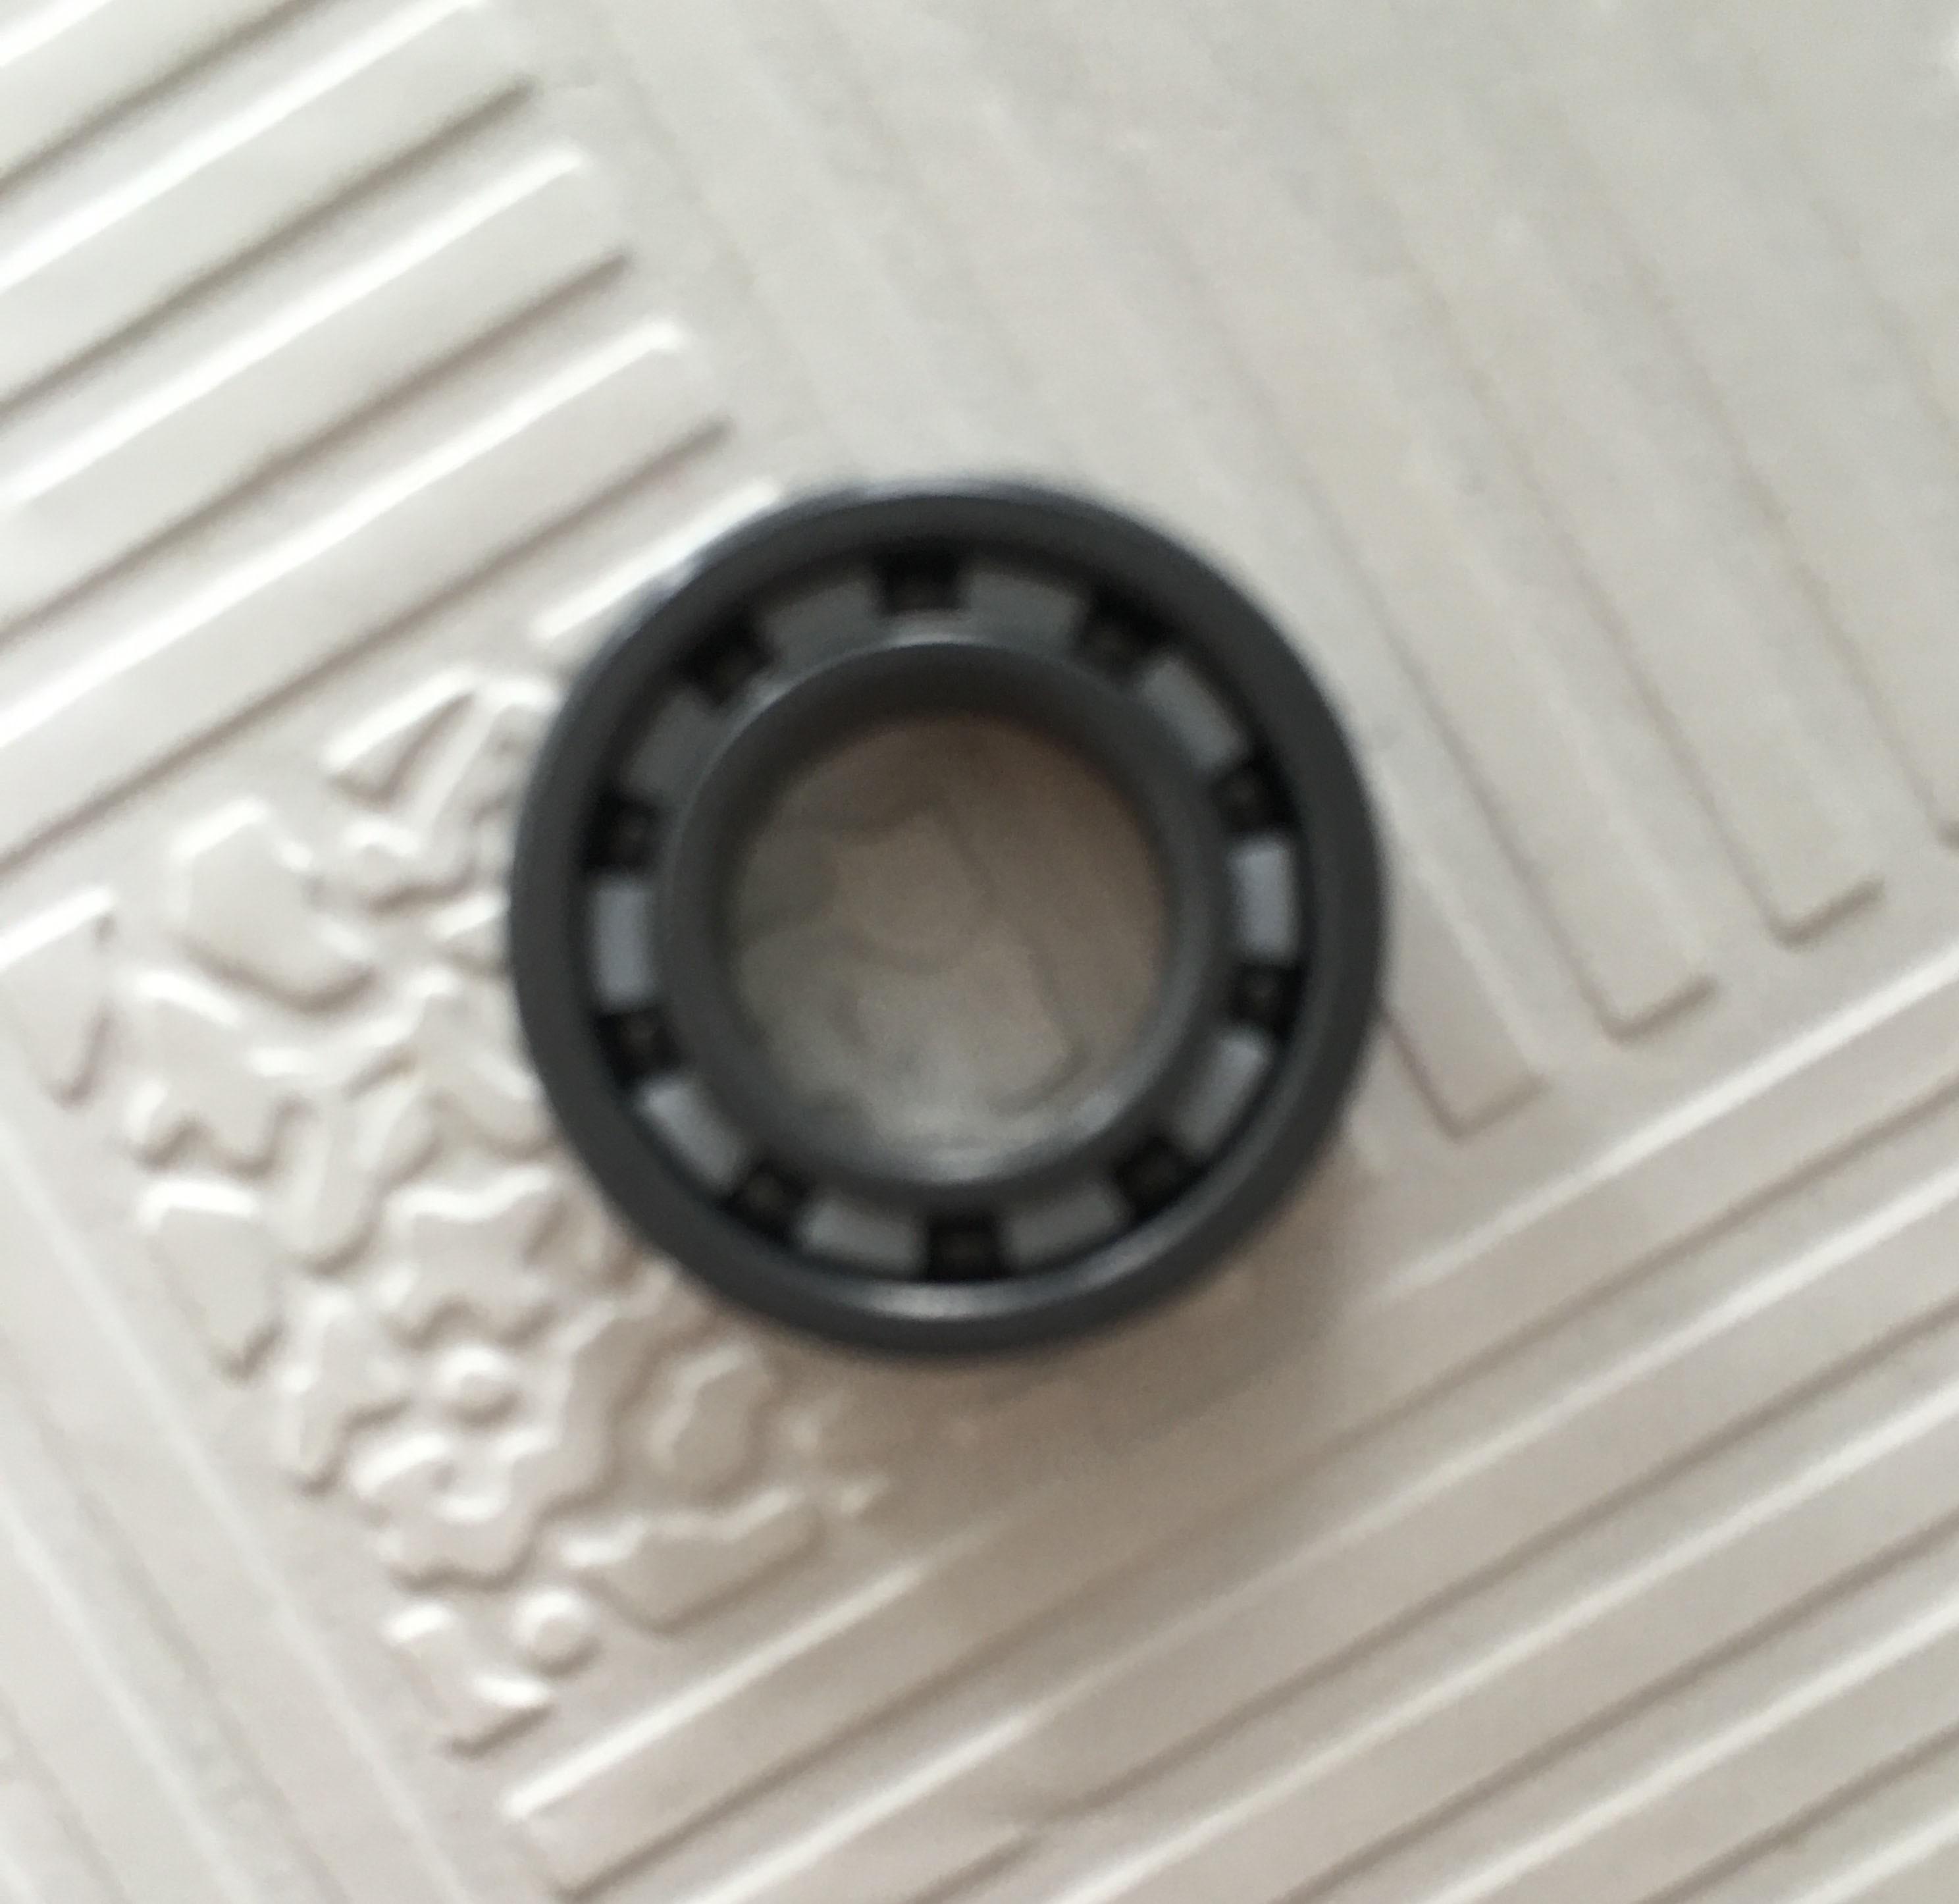 Free shipping 6300 full SI3N4 ceramic deep groove ball bearing 10x35x11mm 6300 full si3n4 ceramic deep groove ball bearing 10x35x11mm p5 abec5